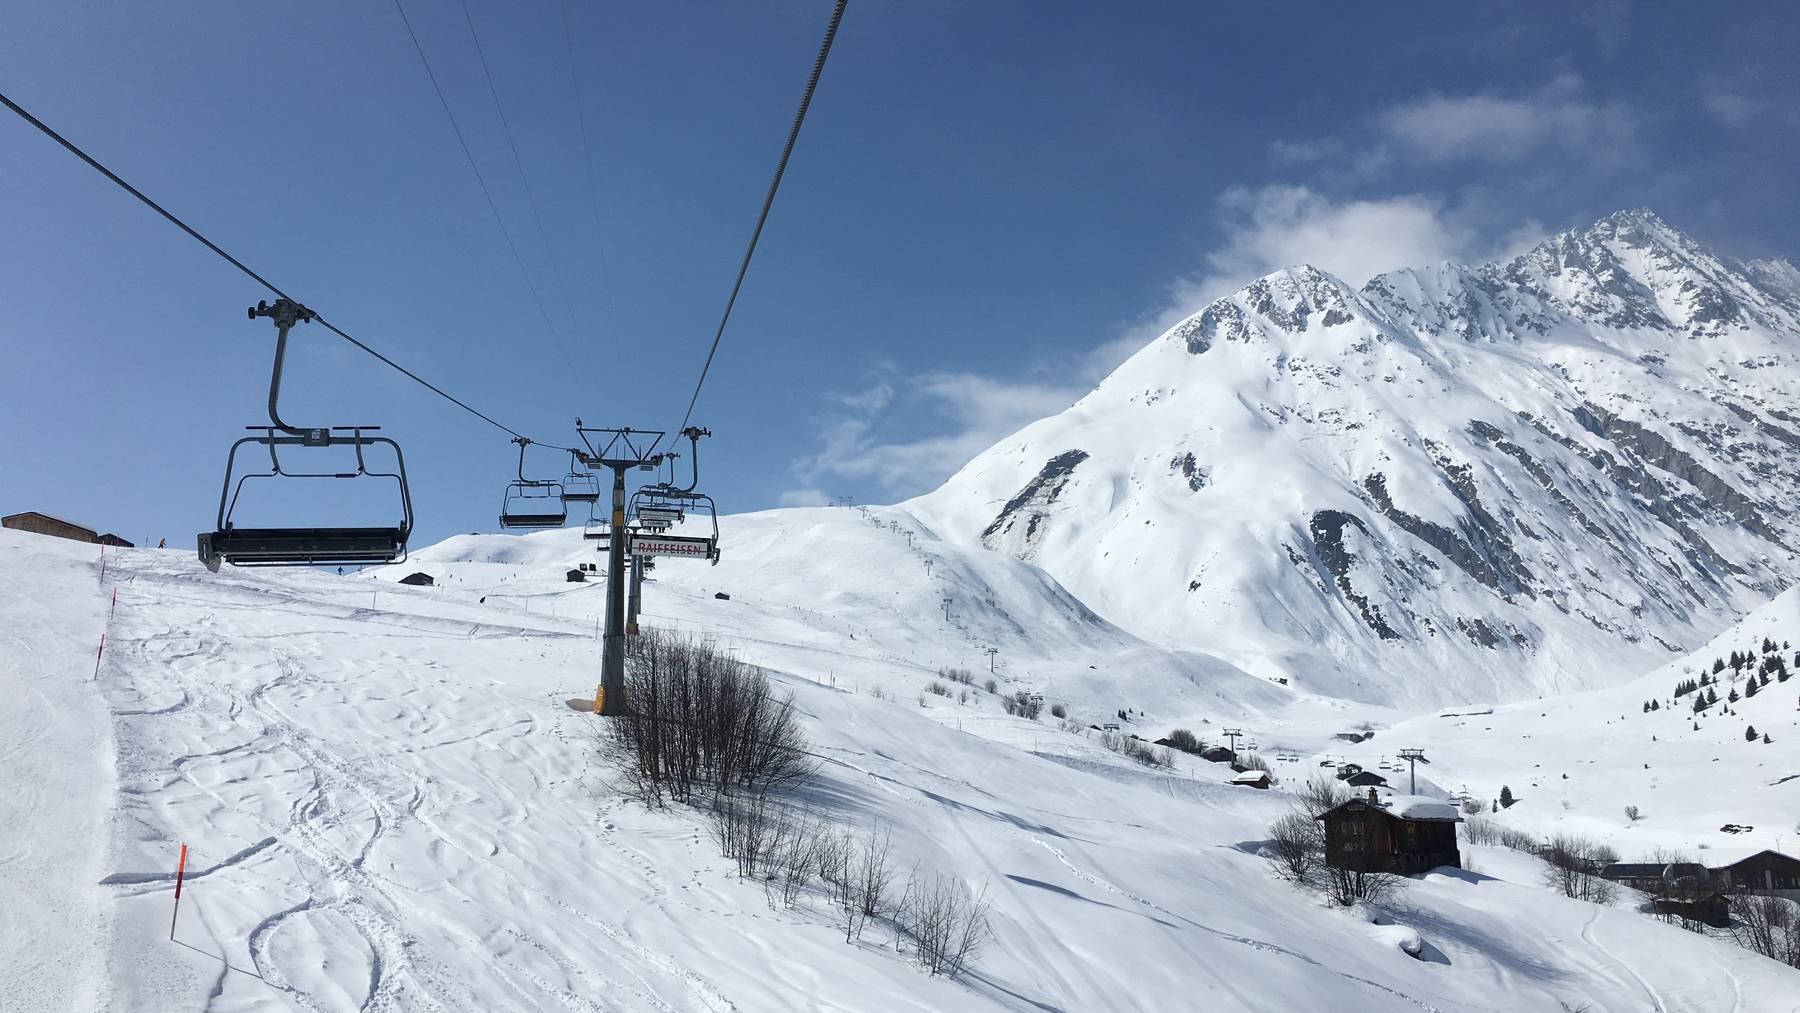 Skiarena Andermatt lockt mit Billig-Angeboten